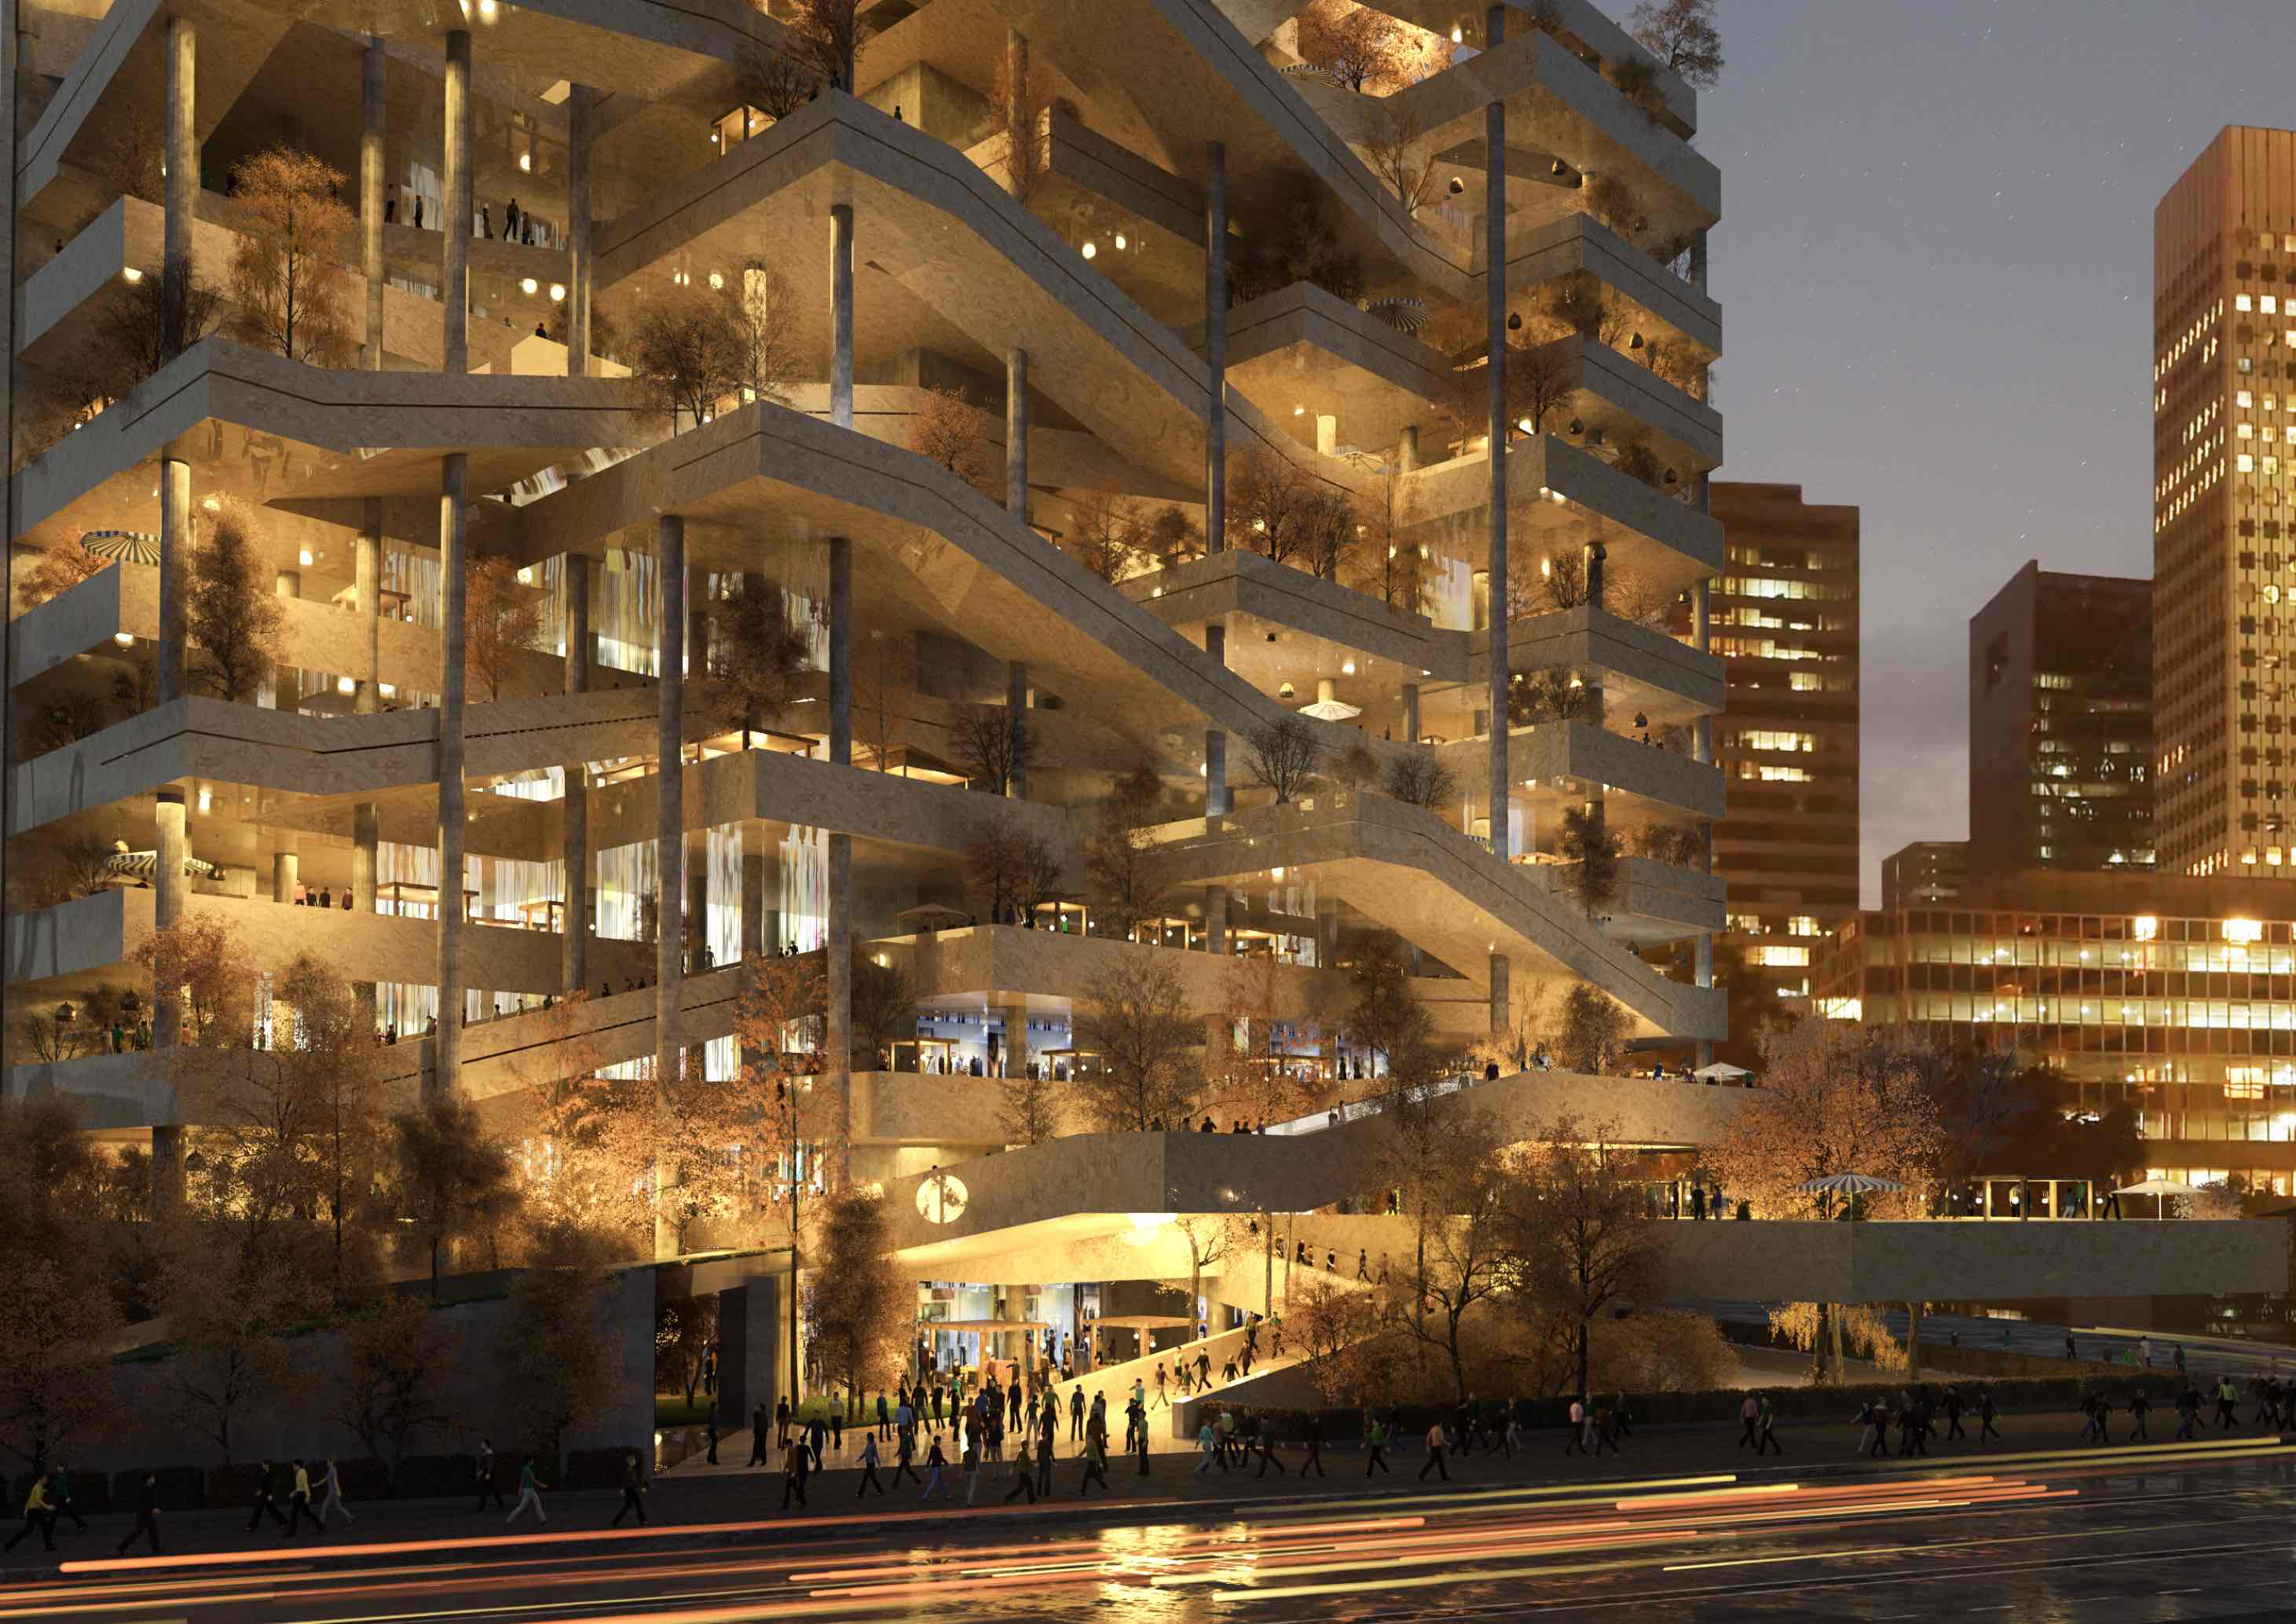 Tehran_Eye_Vertical_Street_Farshad_Mehdizadeh%20_AmazingArchitecture_004.jpg